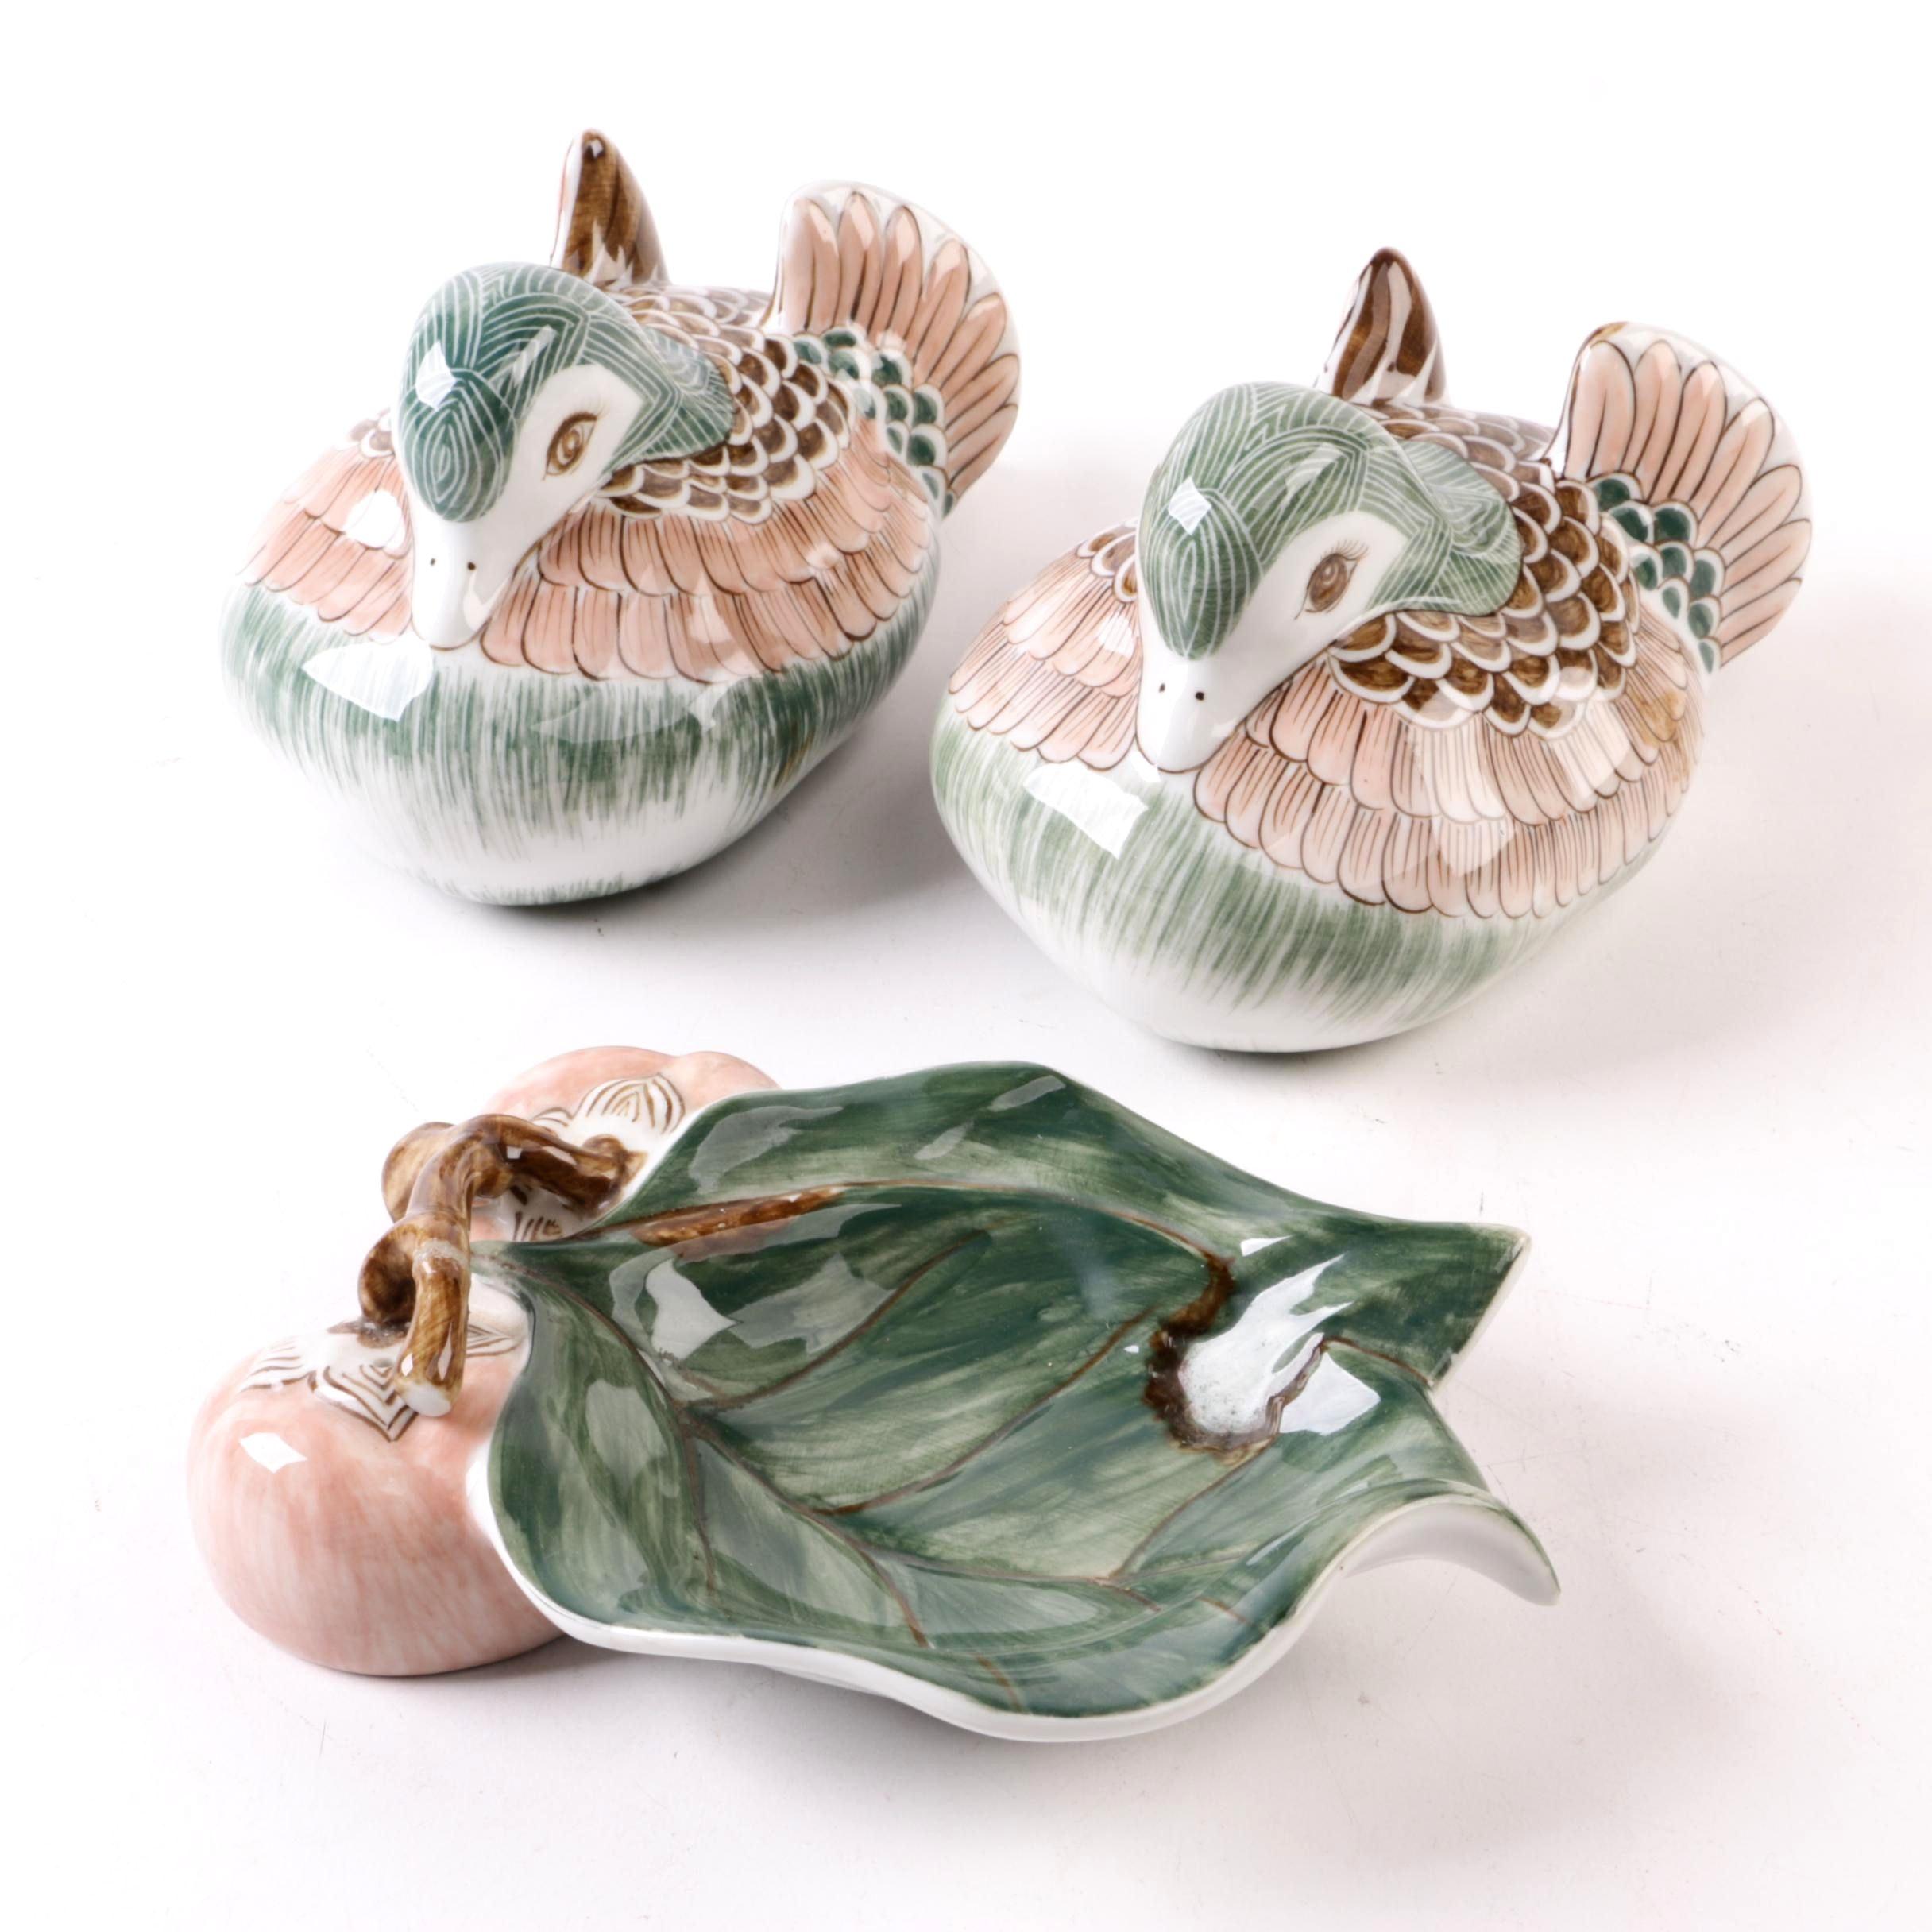 Hand-Painted Ceramic Duck Figurines and Cherry Dish